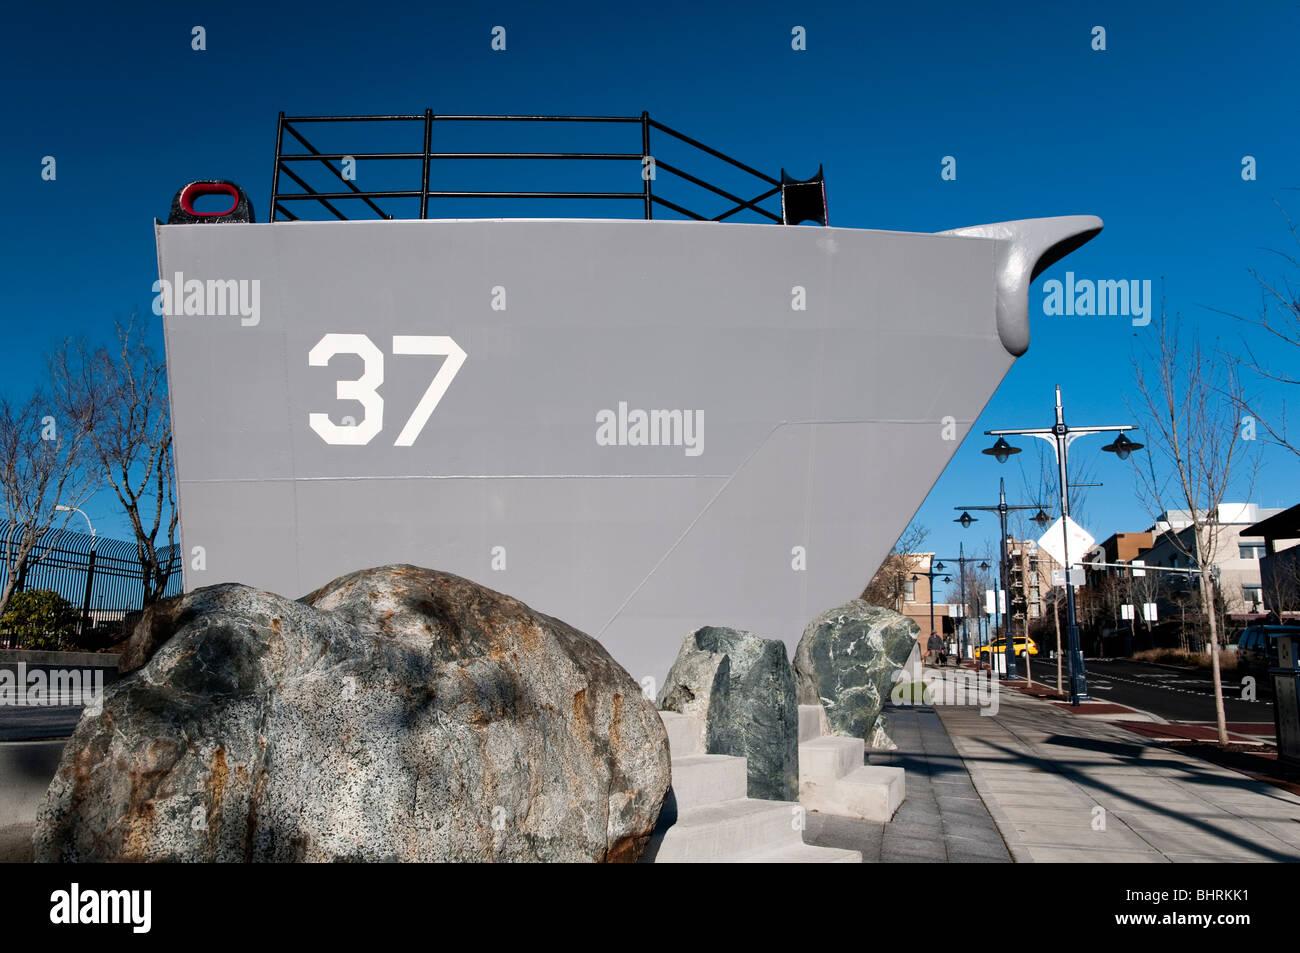 UNS Marine u-Boot-Denkmal vor dem Marinemuseum Bremerton, Bremerton, Washington, USA Stockbild